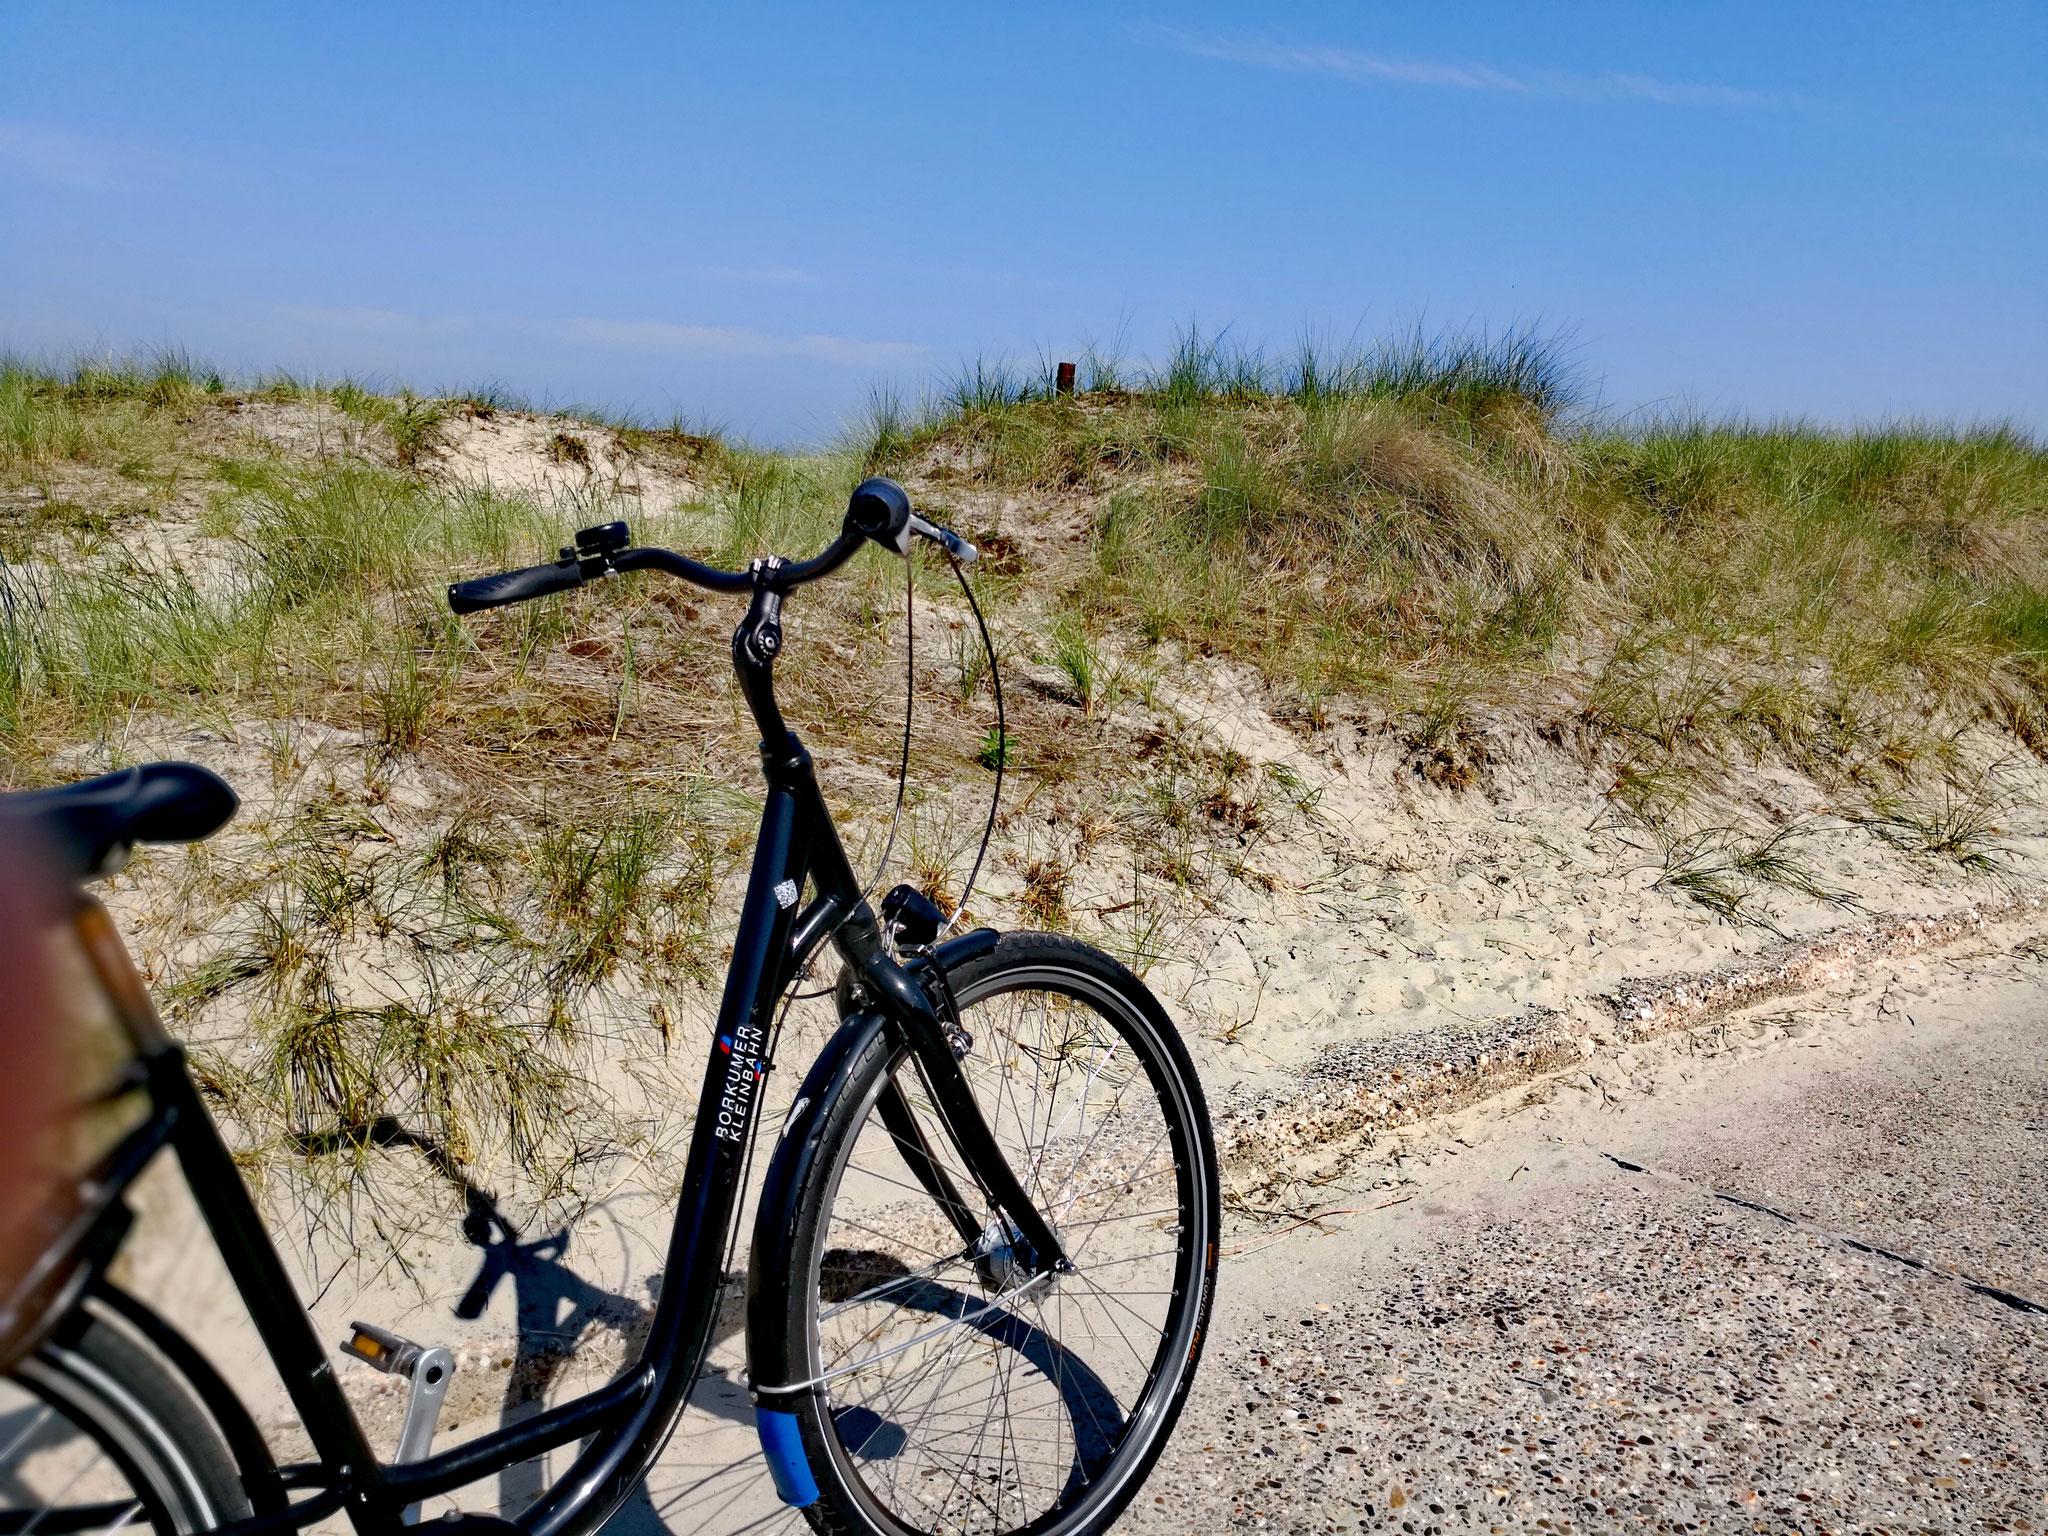 Borkum Karte Fahrradwege.Nordsee Insel Borkum Mamicheck Ch Erholsame Ferien Dank